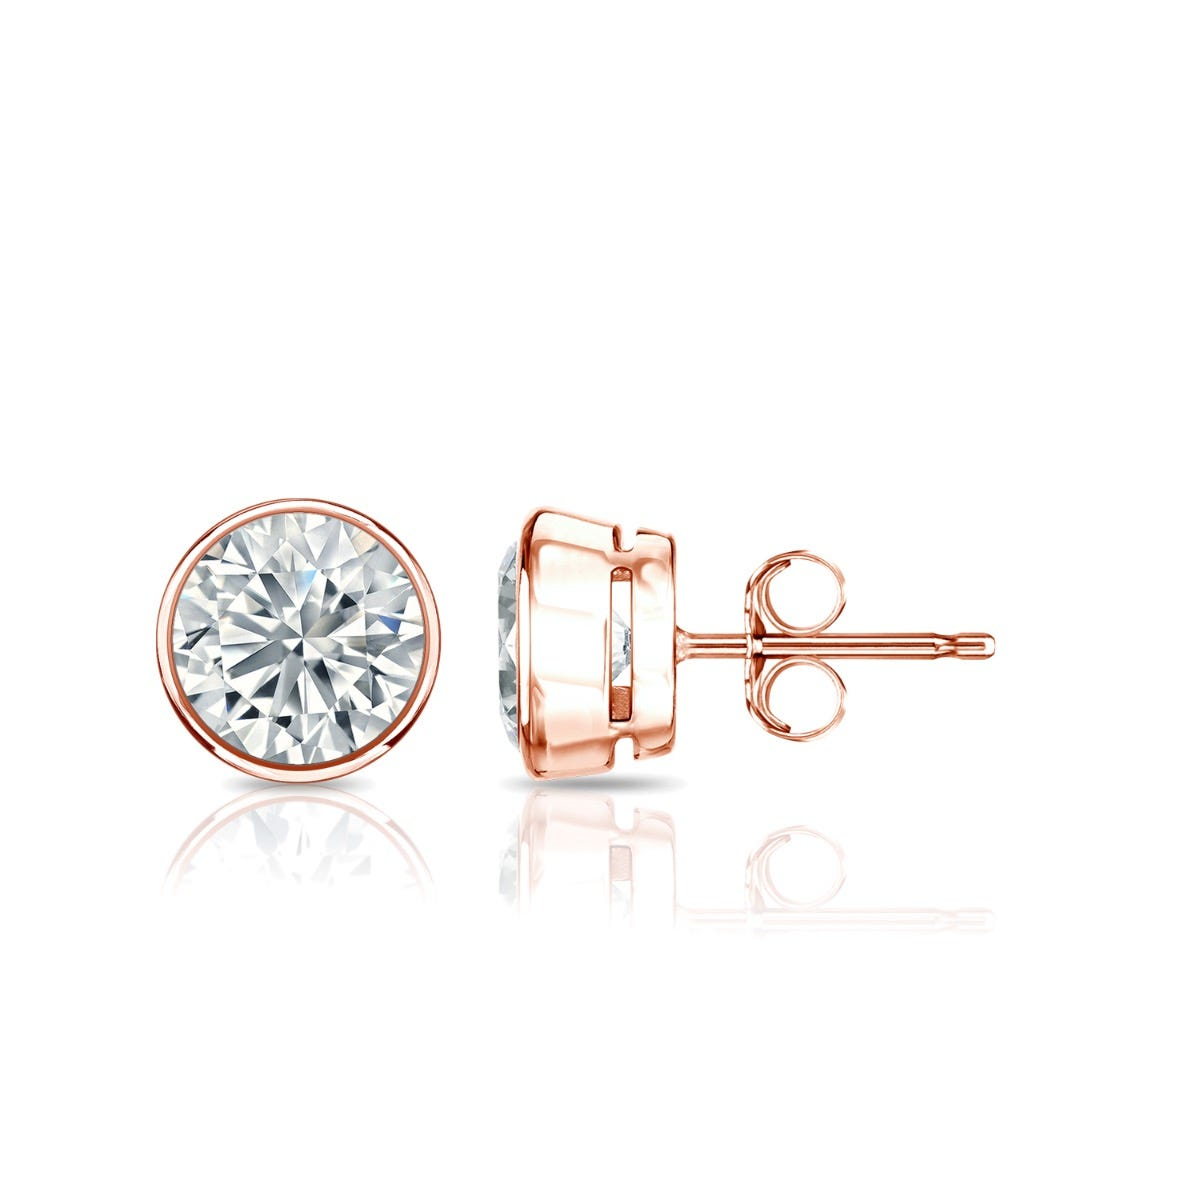 Diamond Round Bezel-Set 1ctw. Solitaire Stud (IJ-VS2) Earrings in 14K Rose Gold